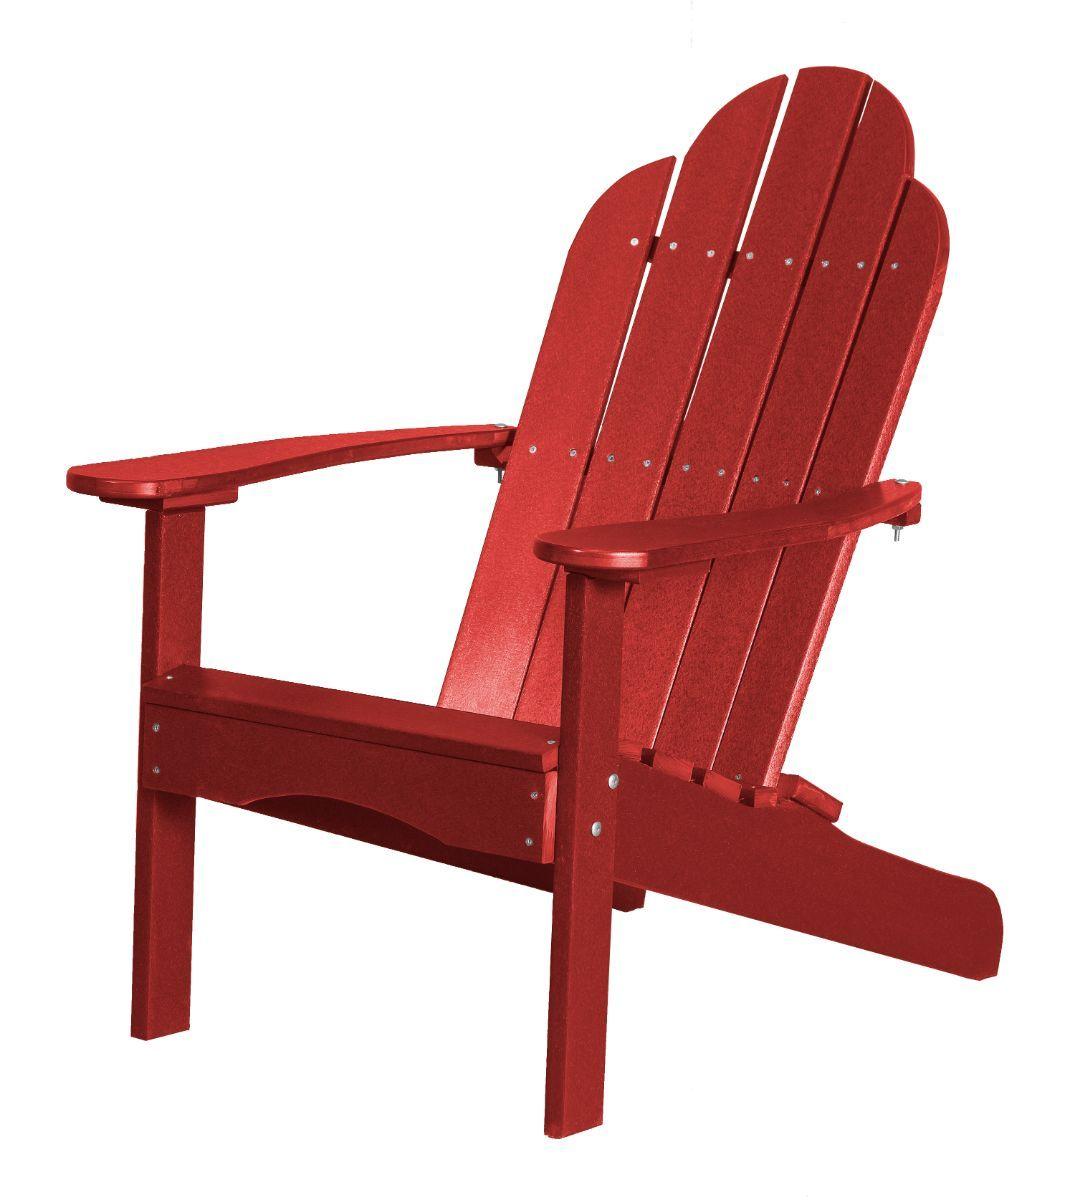 Cardinal Red Odessa Adirondack Chair